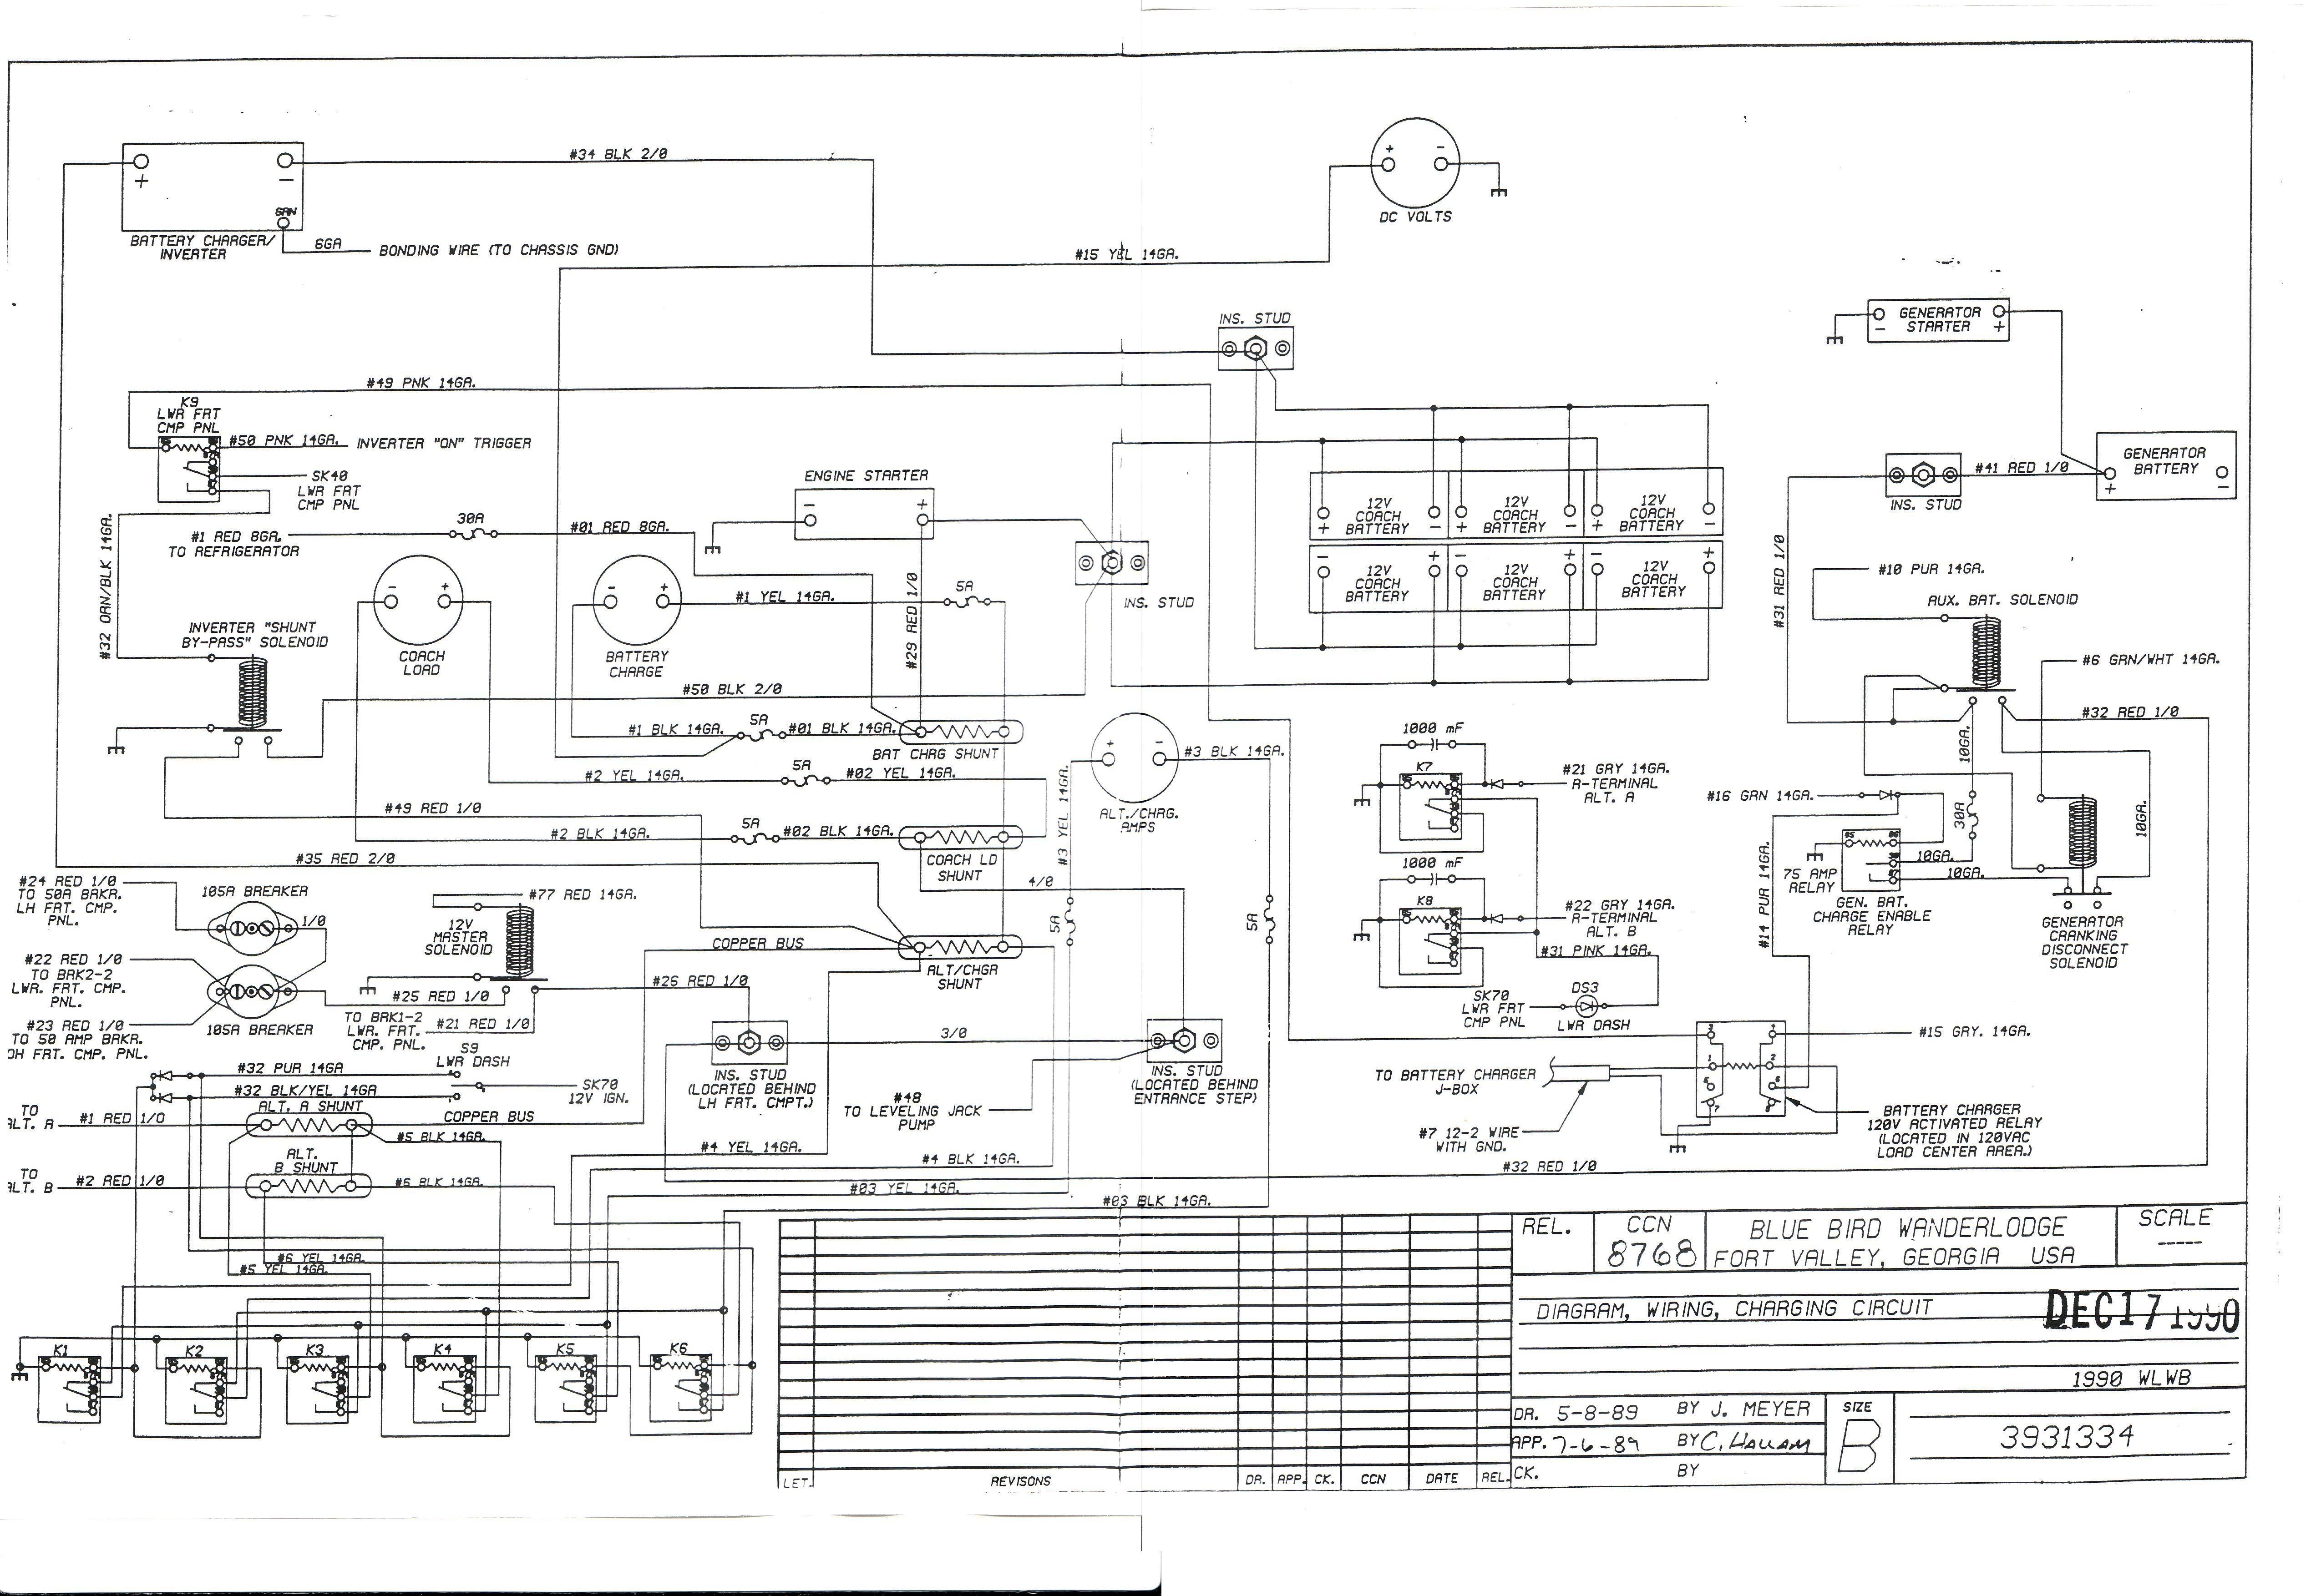 bluebird wiring diagrams schematic diagram Goshen Coach Wiring Diagrams wiring diagrams 1998 bluebird all wiring diagram data workhorse p32 wiring diagram bluebird wiring diagrams